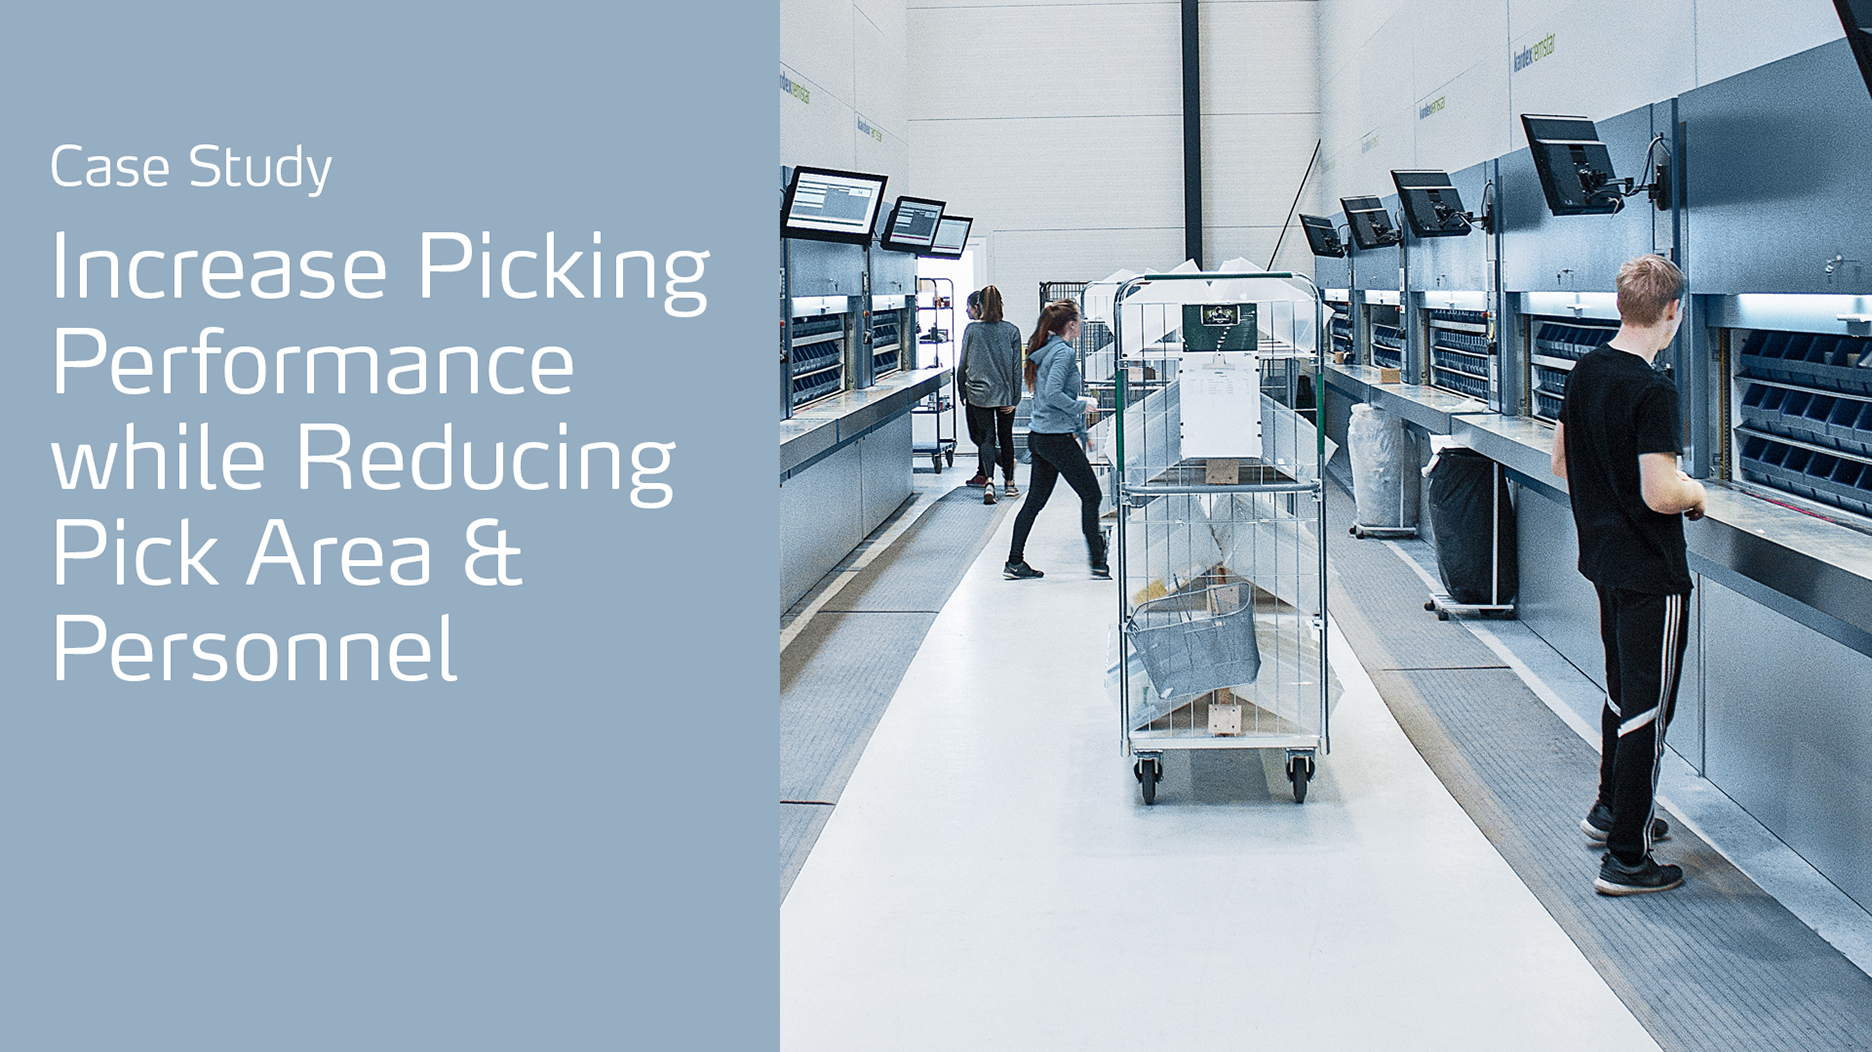 E-Commerce Warehousing | Automated Storage & Order Picking | Kardex